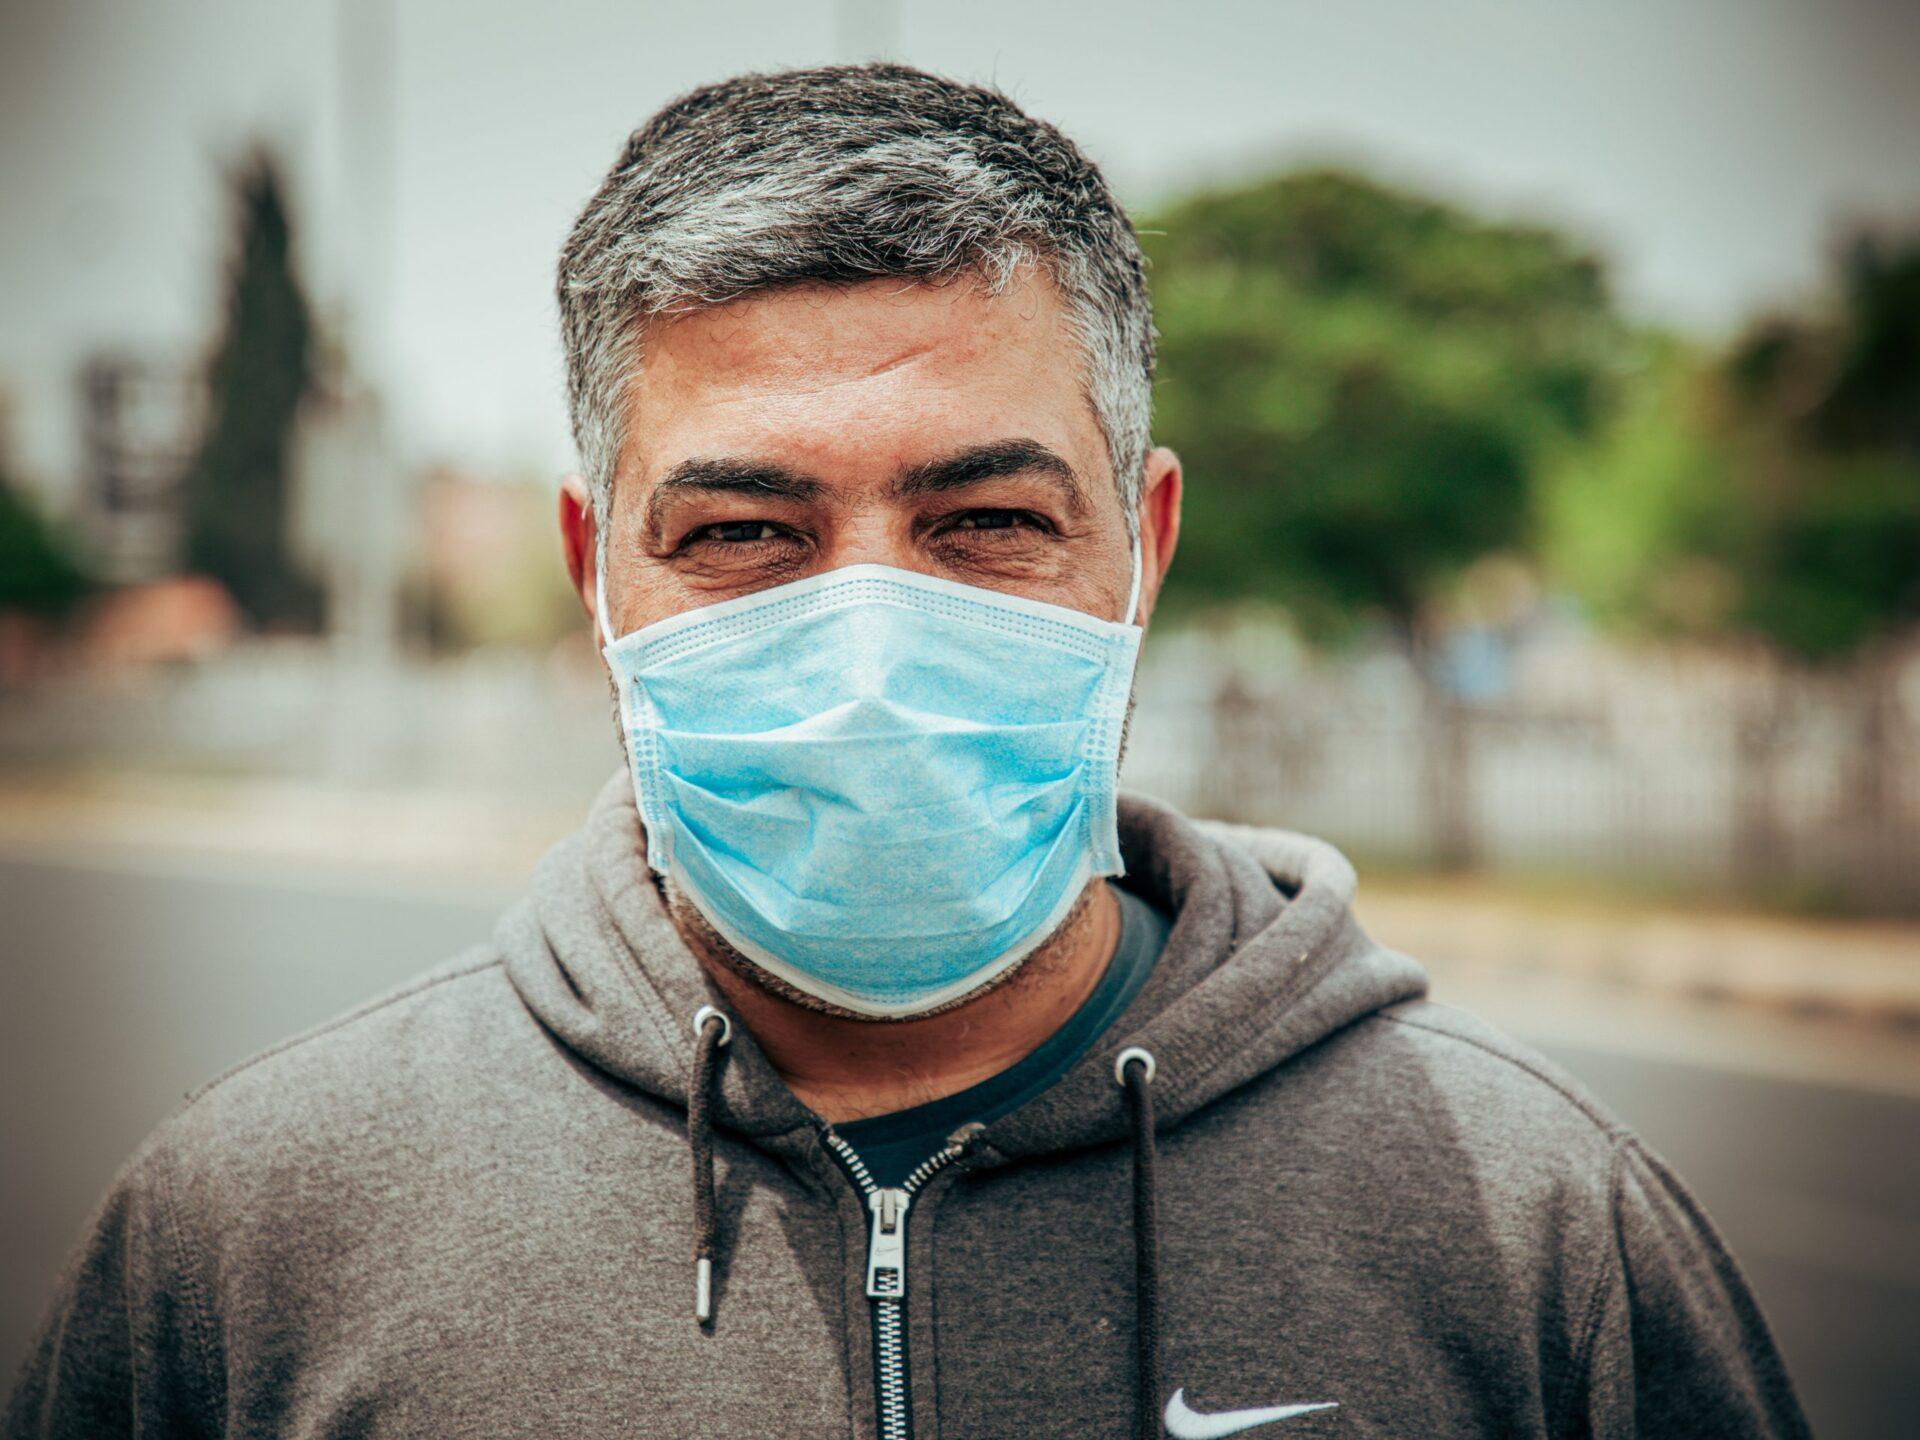 covid-19, coronavirus, pandemic, bernard law group, FoodLine donation